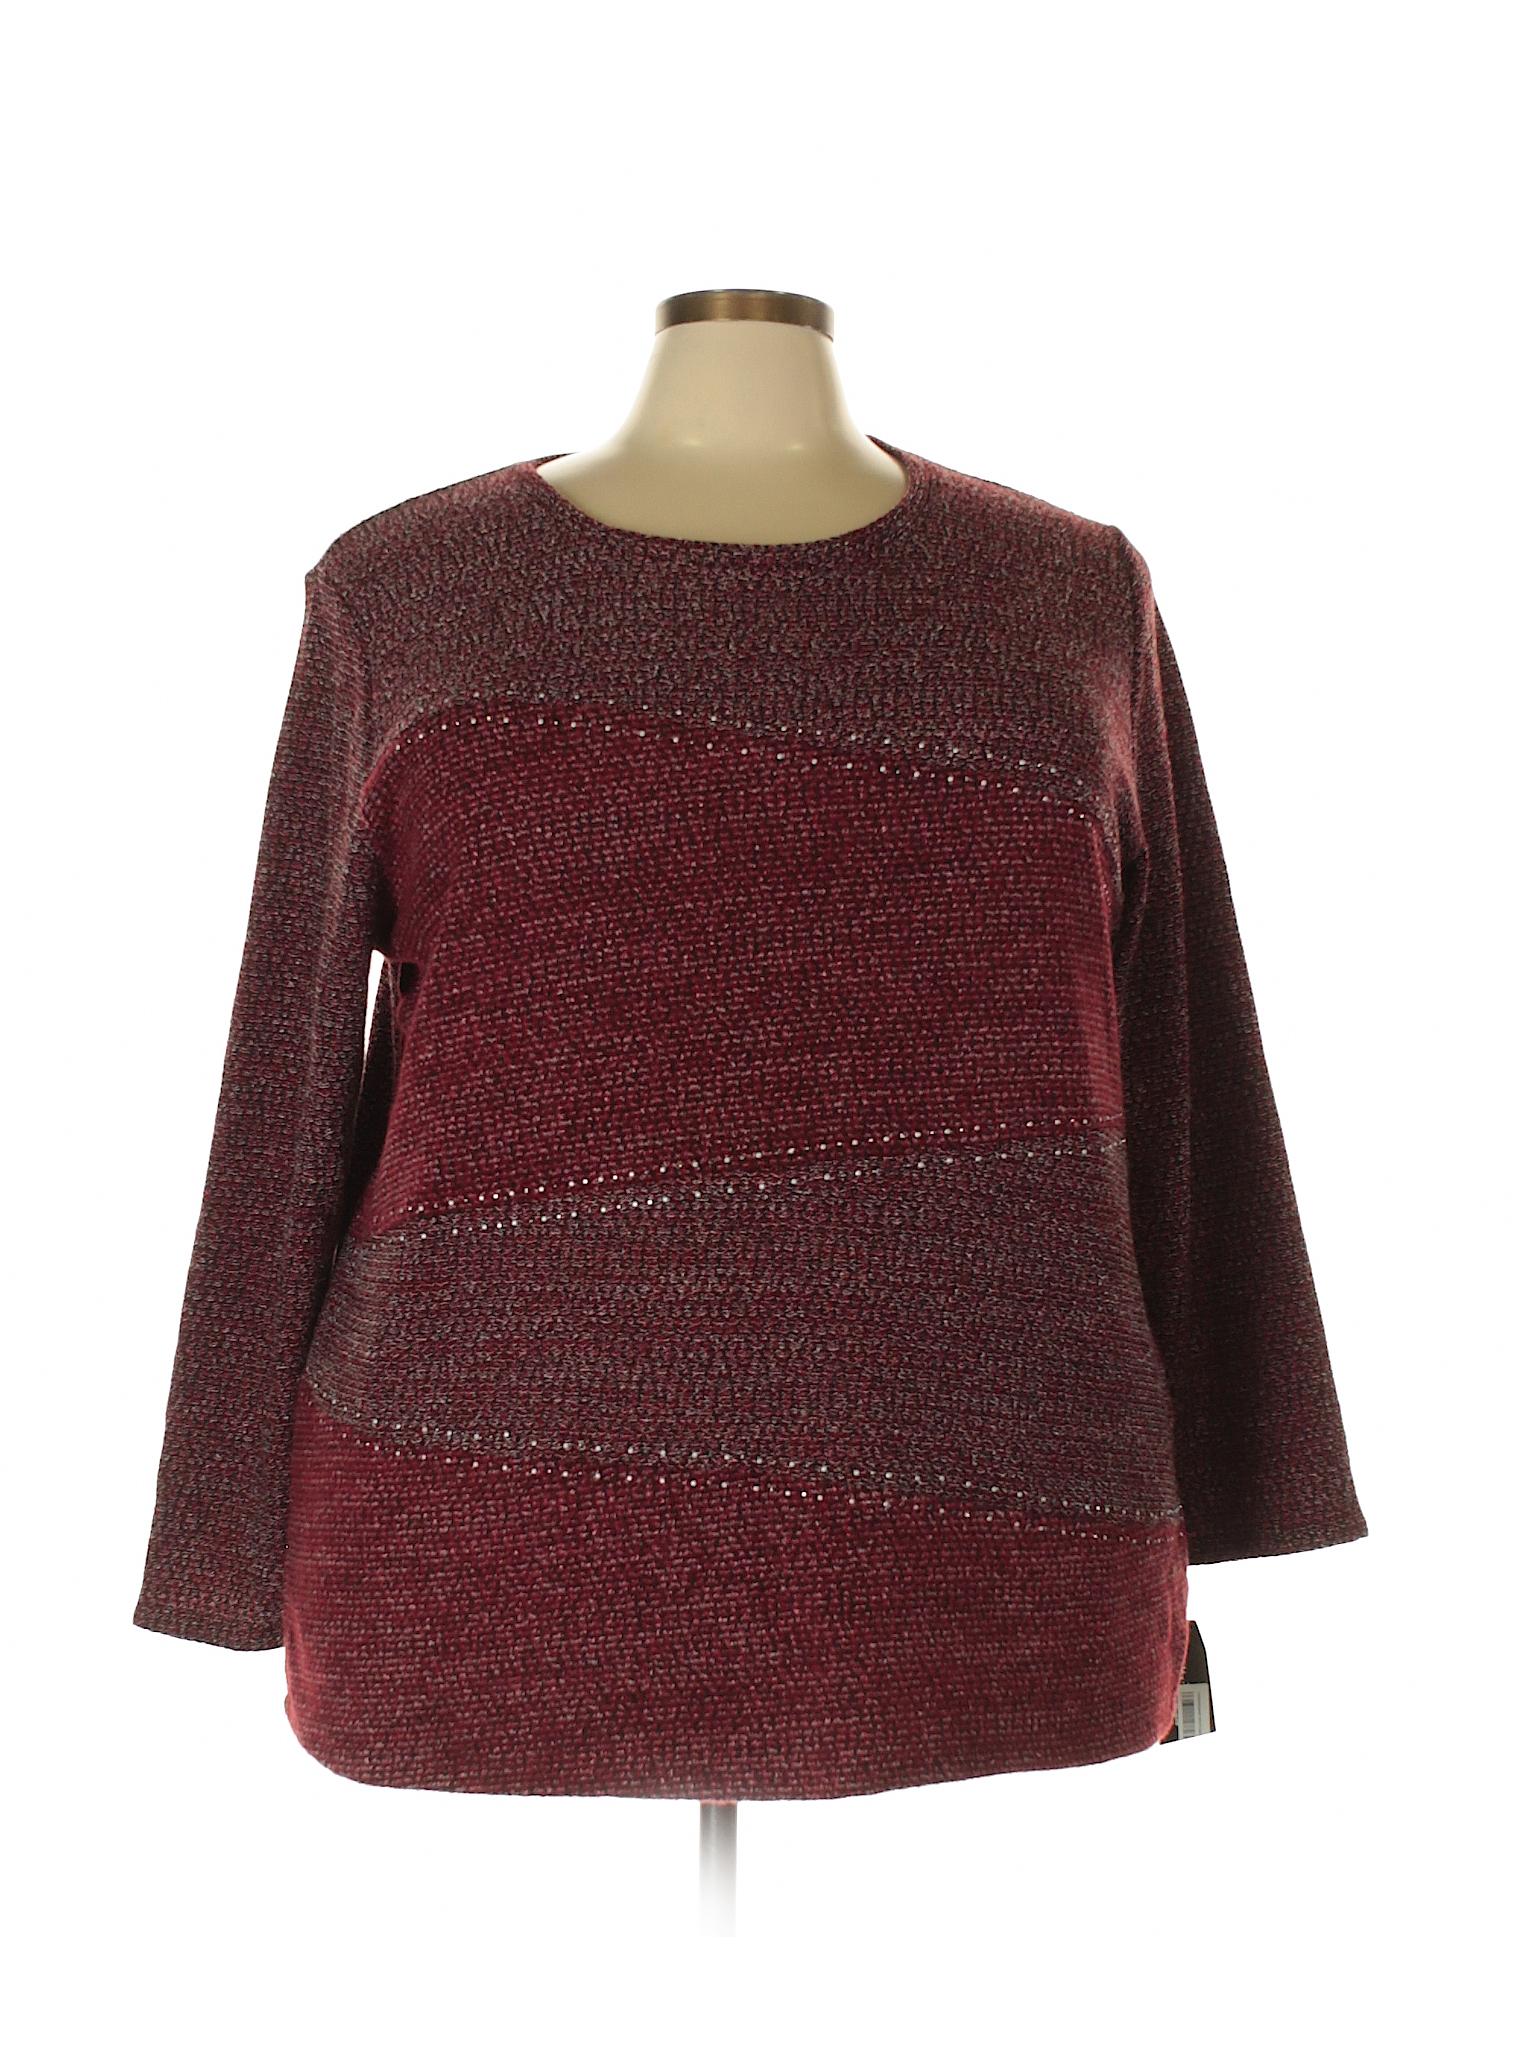 winter amp;Co Style Sweater Boutique Pullover 1FSw7q